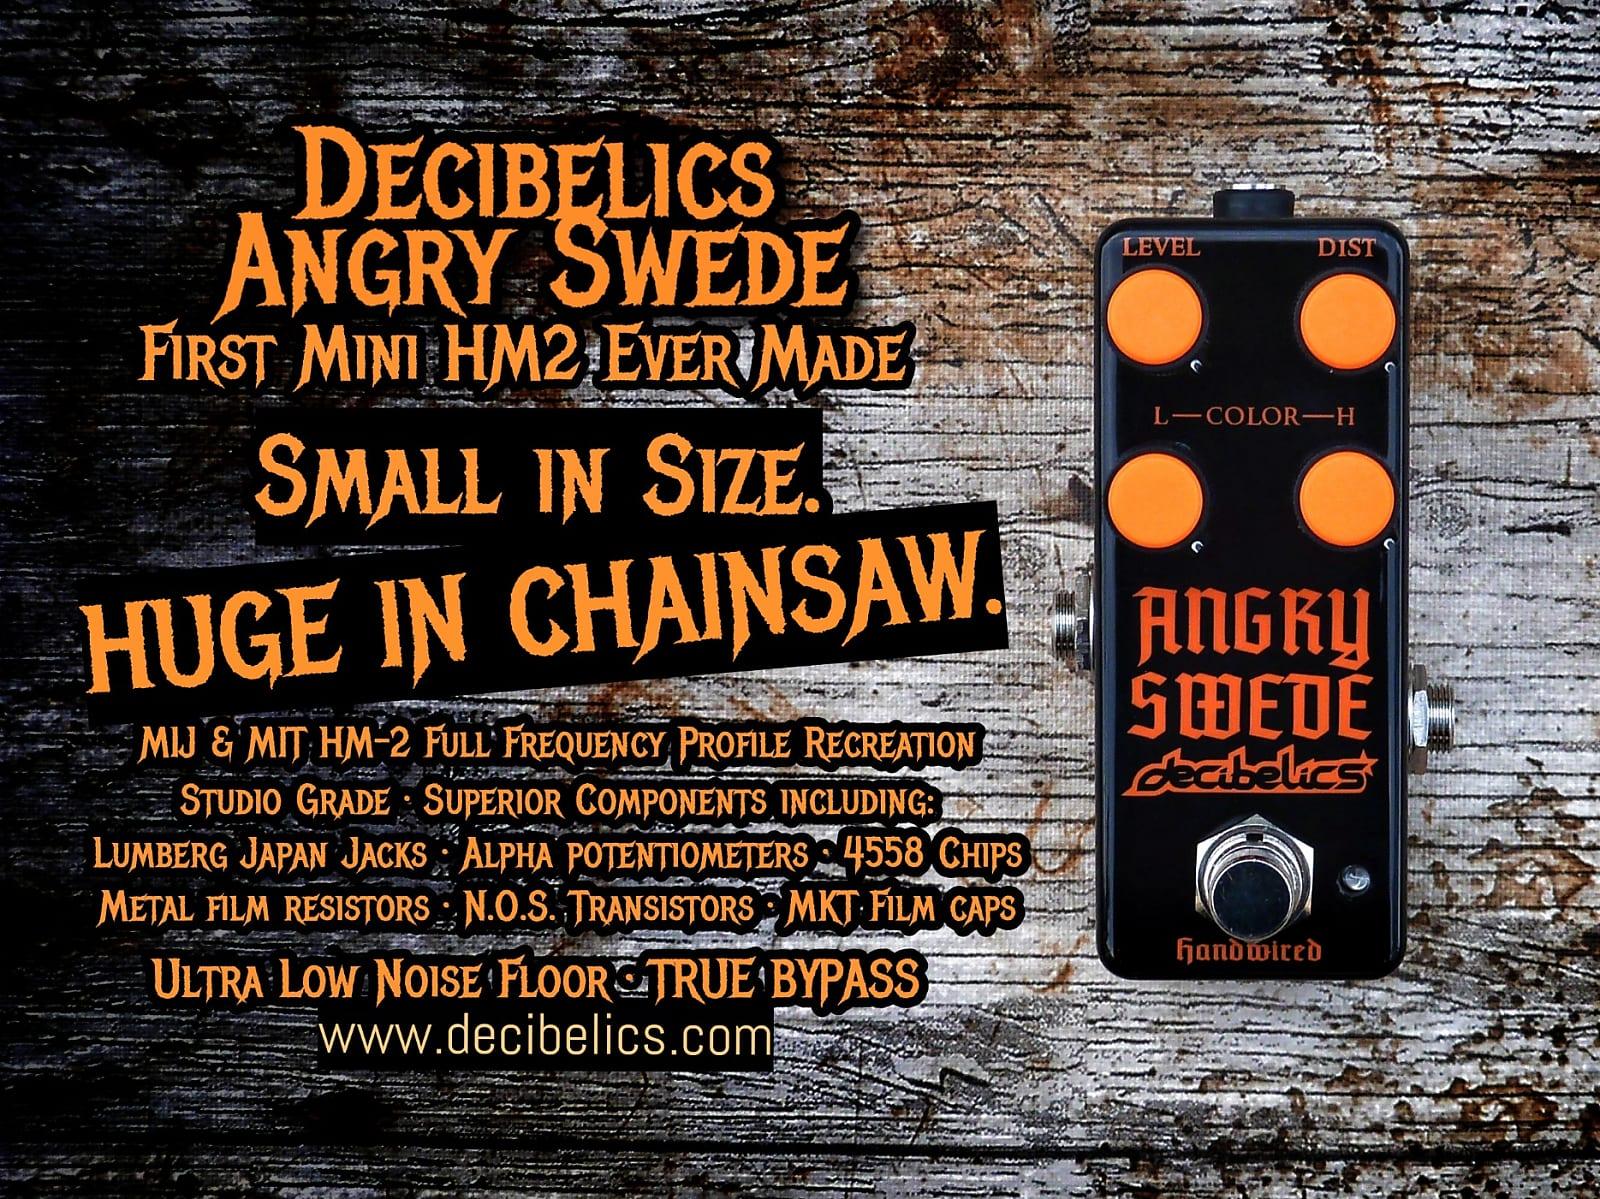 Decibelics Angry Swede | The Mini HM2 clone